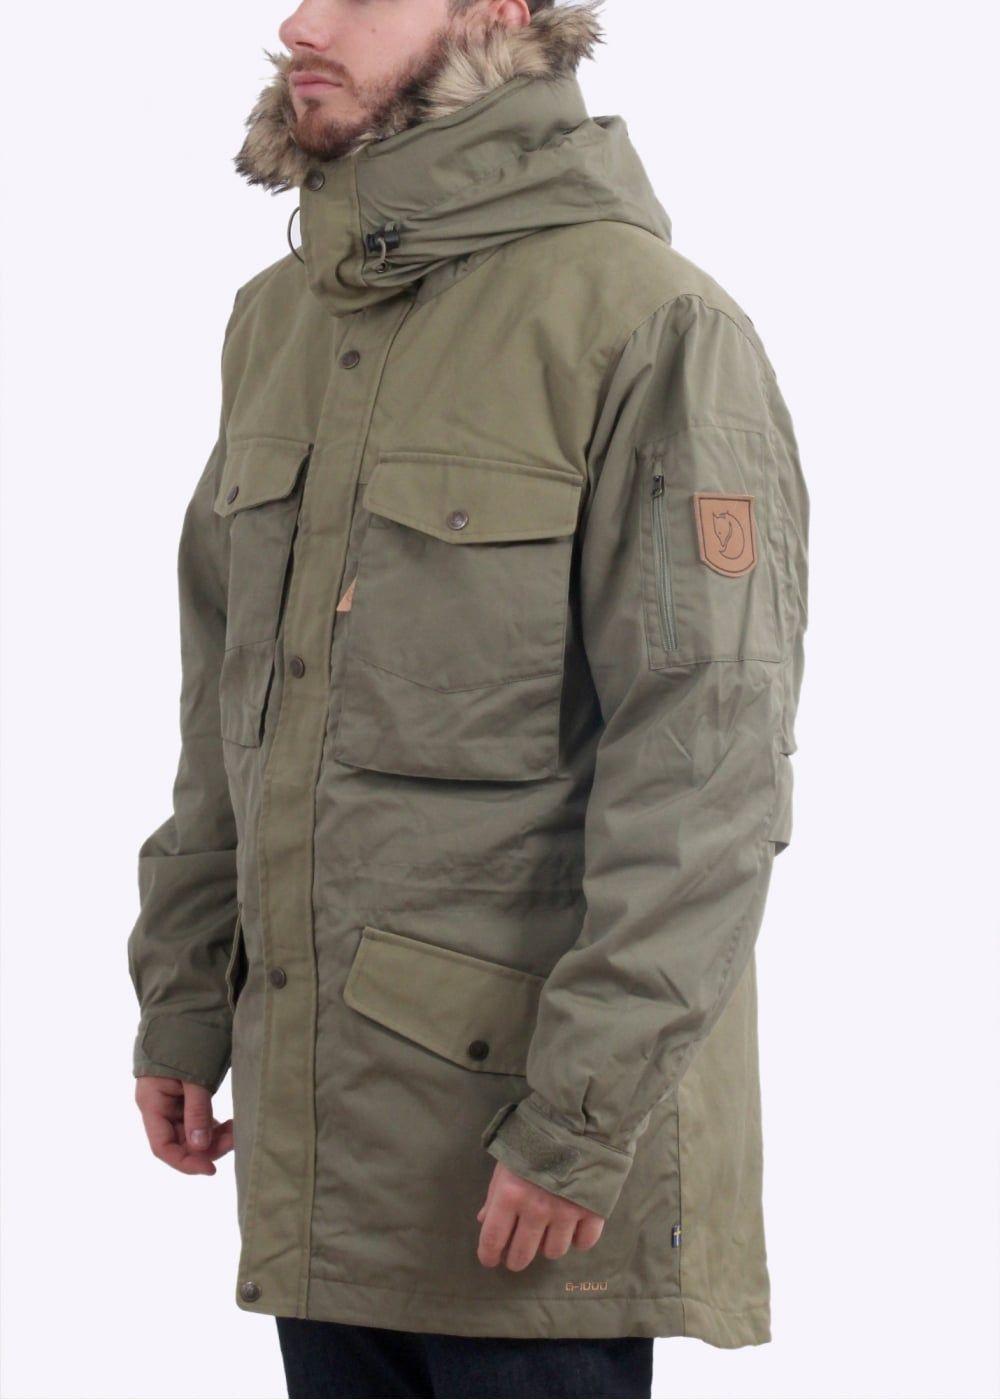 fjallraven winter jacket cheap